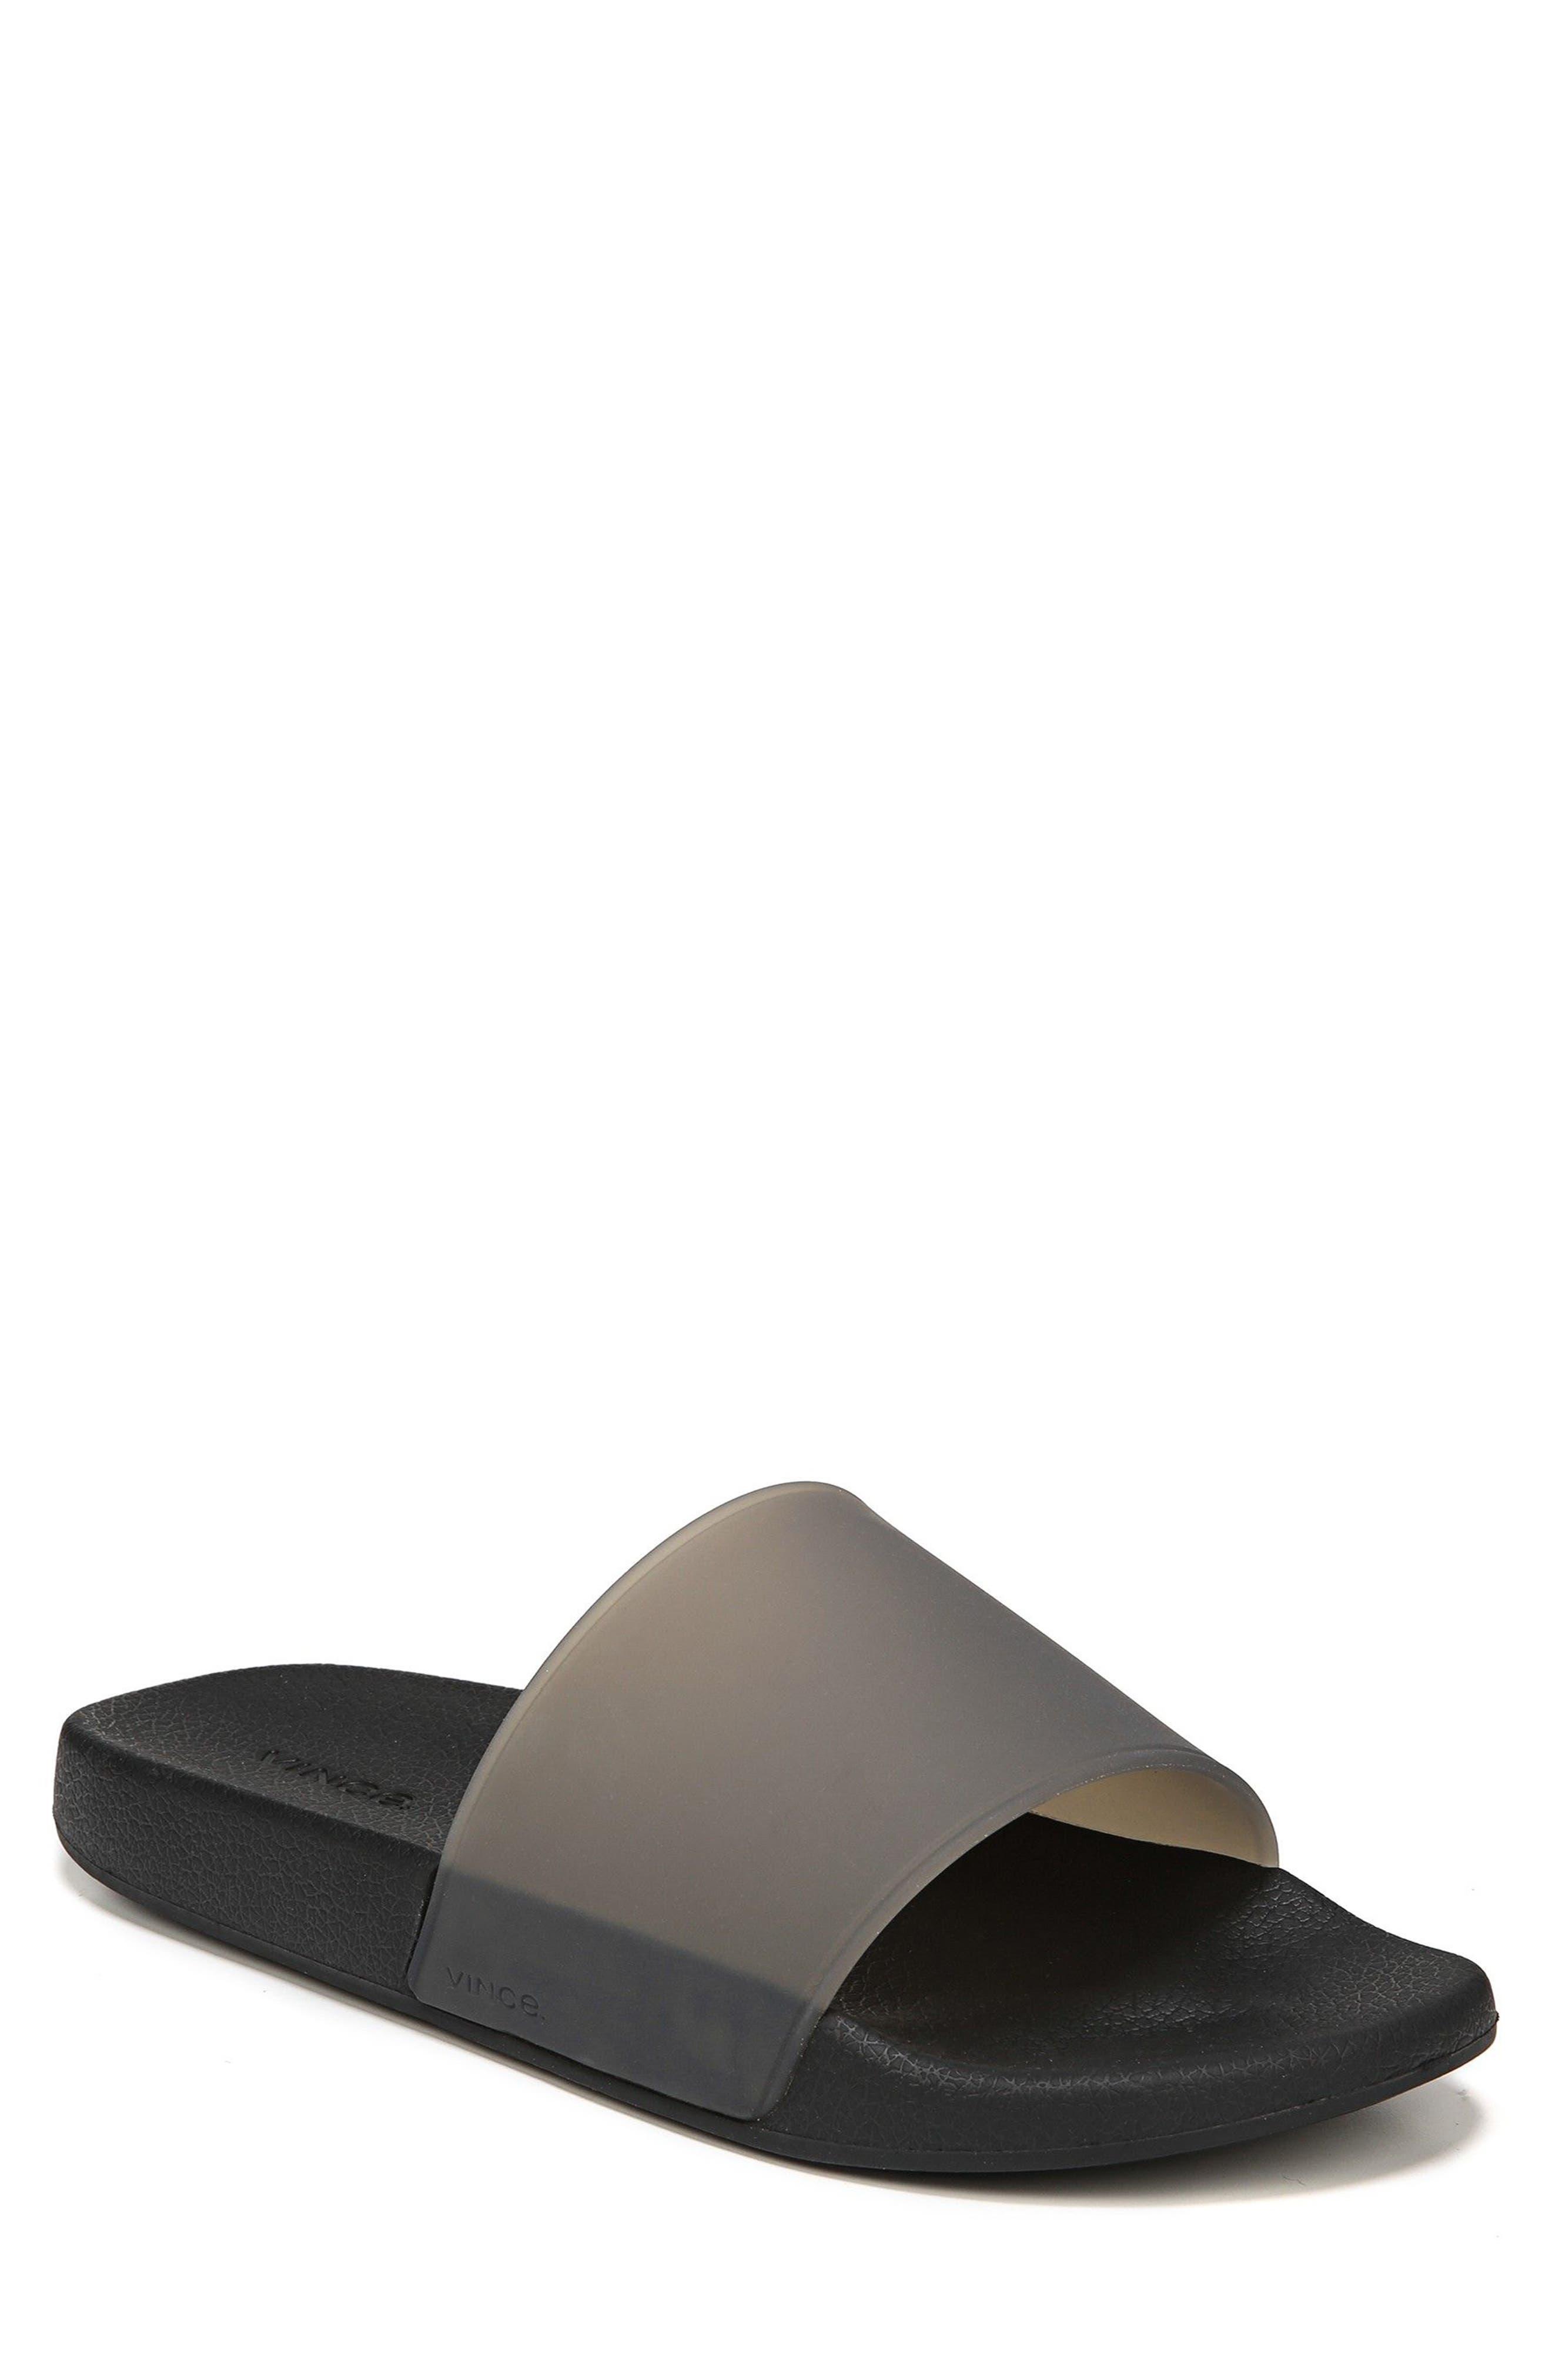 Main Image - Vince Westcoast Sport Sandal (Men)